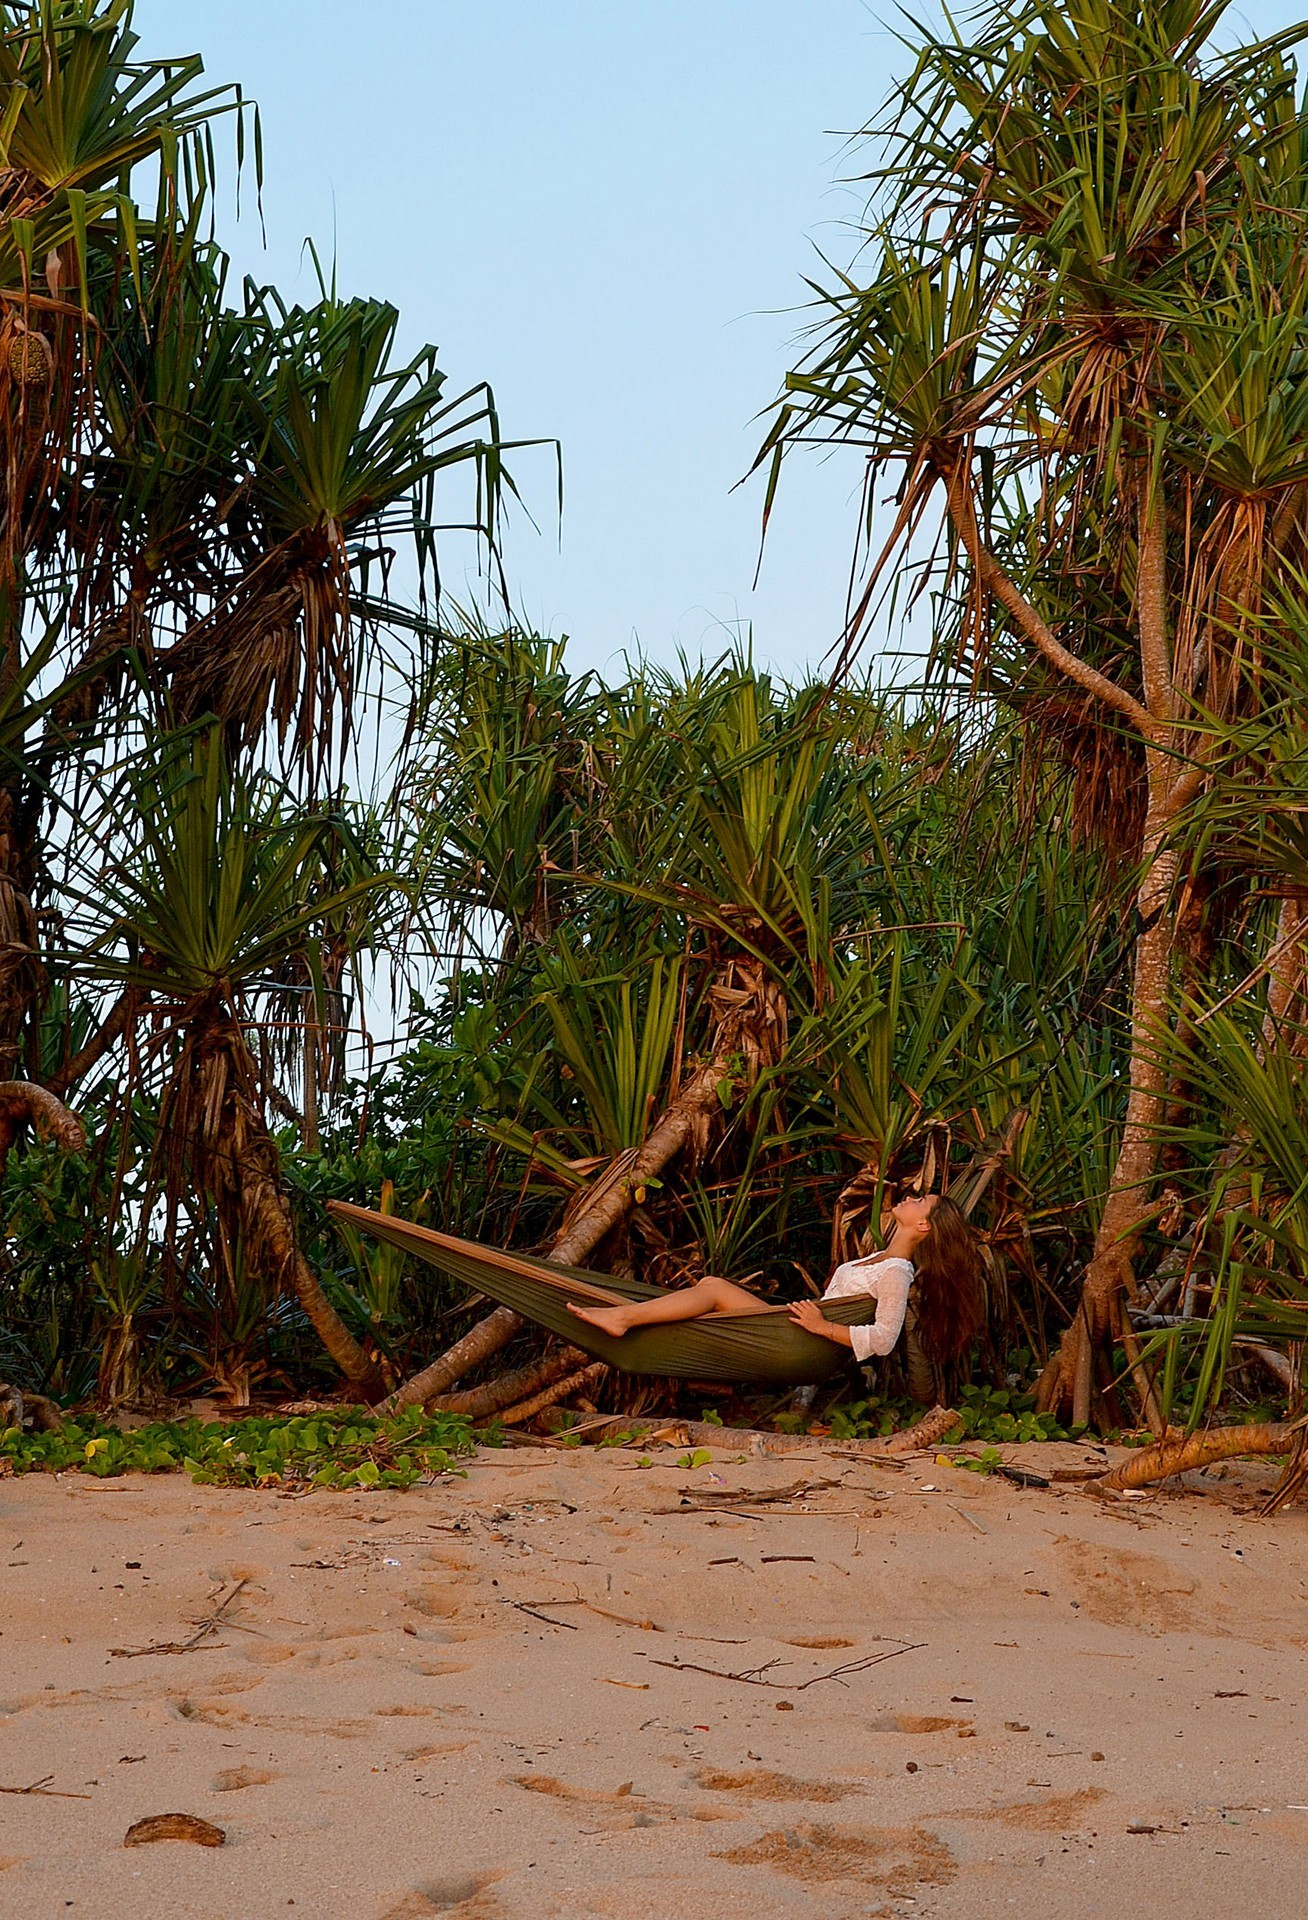 Сплю на необитаемом острове в гамаке.